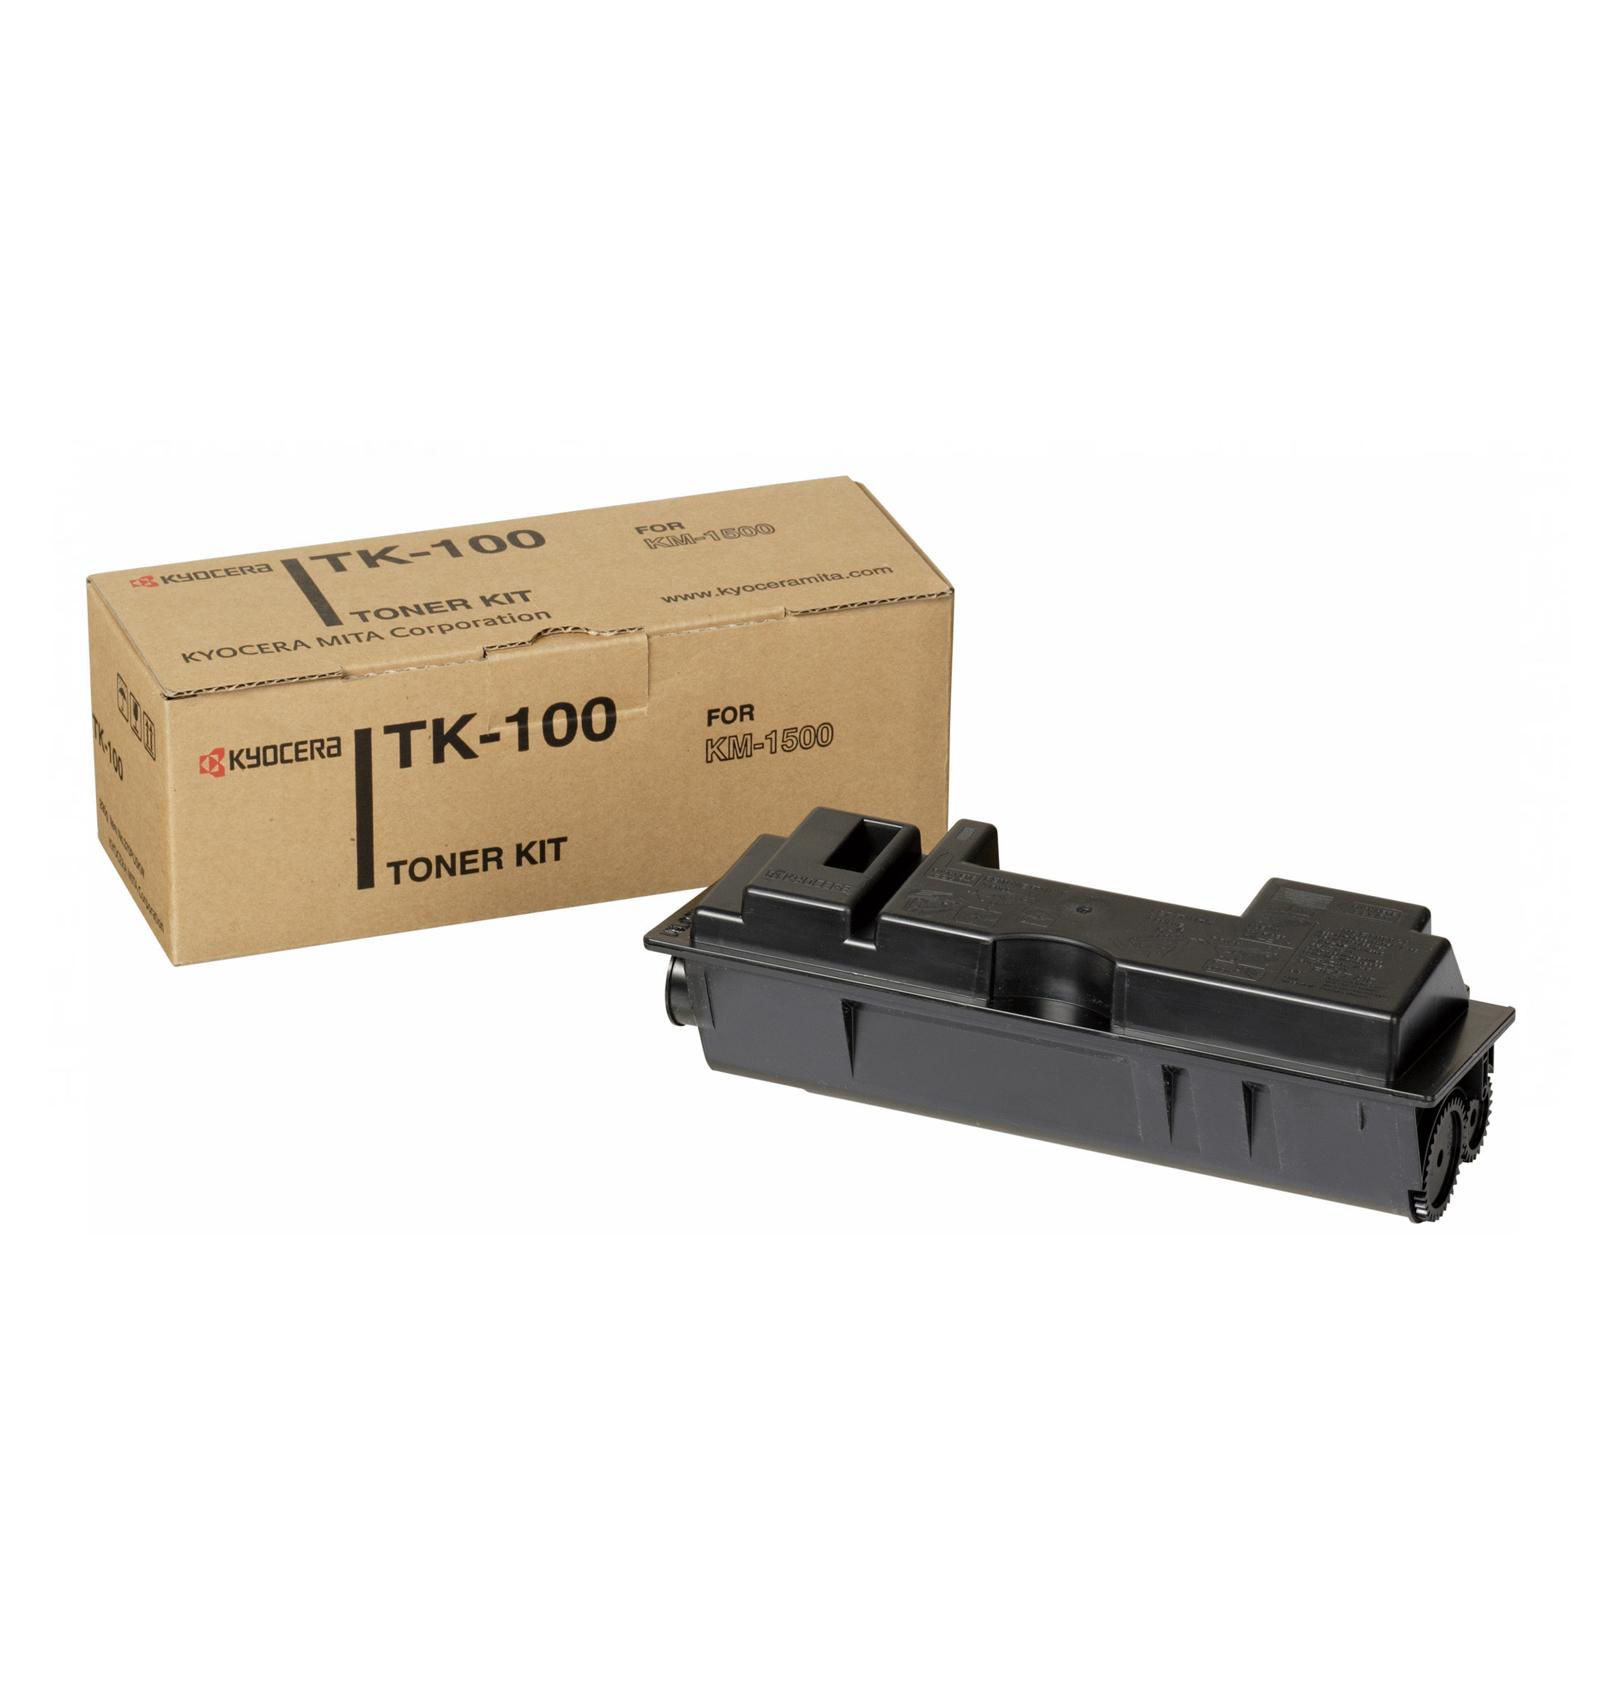 Kyocera TK-100 для KM-1500